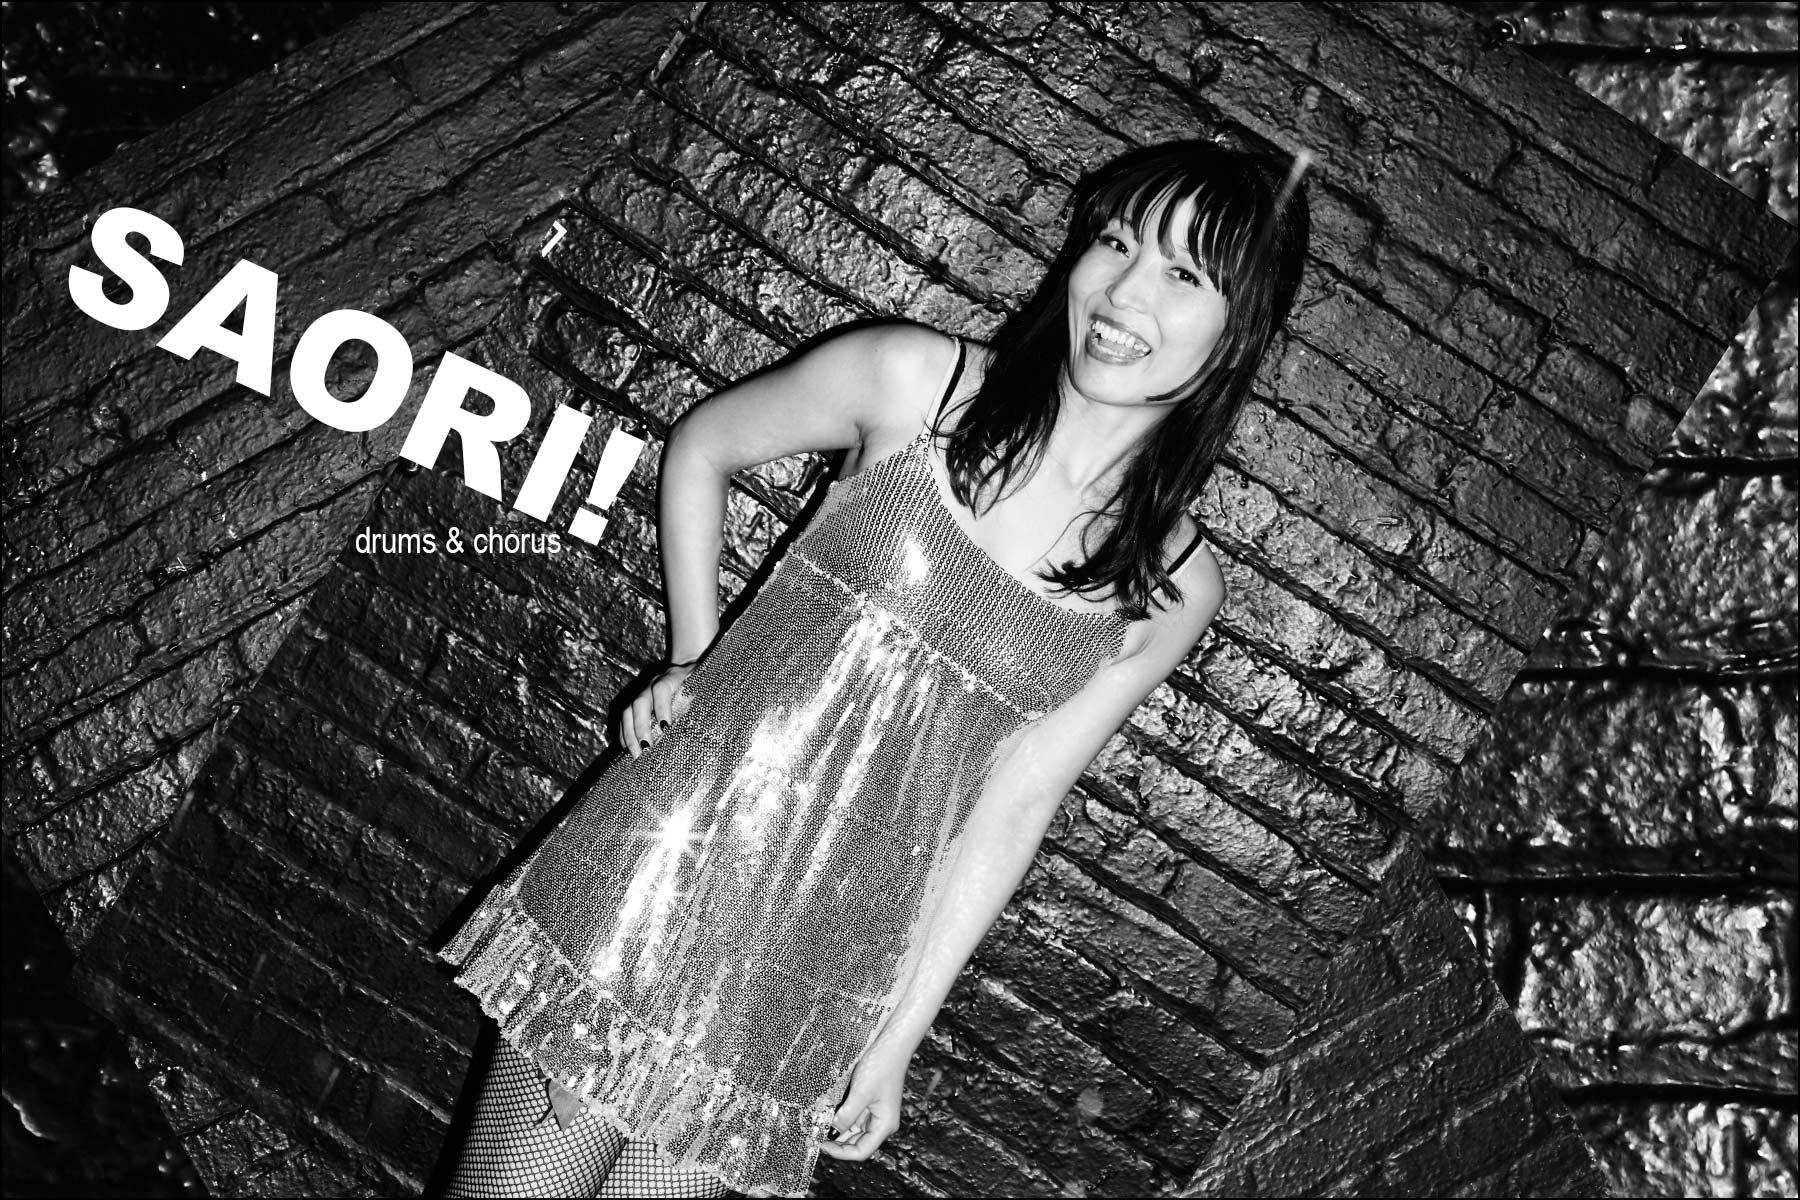 Saori! Drums & chorus, Stompin Riffraffs. Photographed by Alexander Thompson for Ponyboy magazine NY.